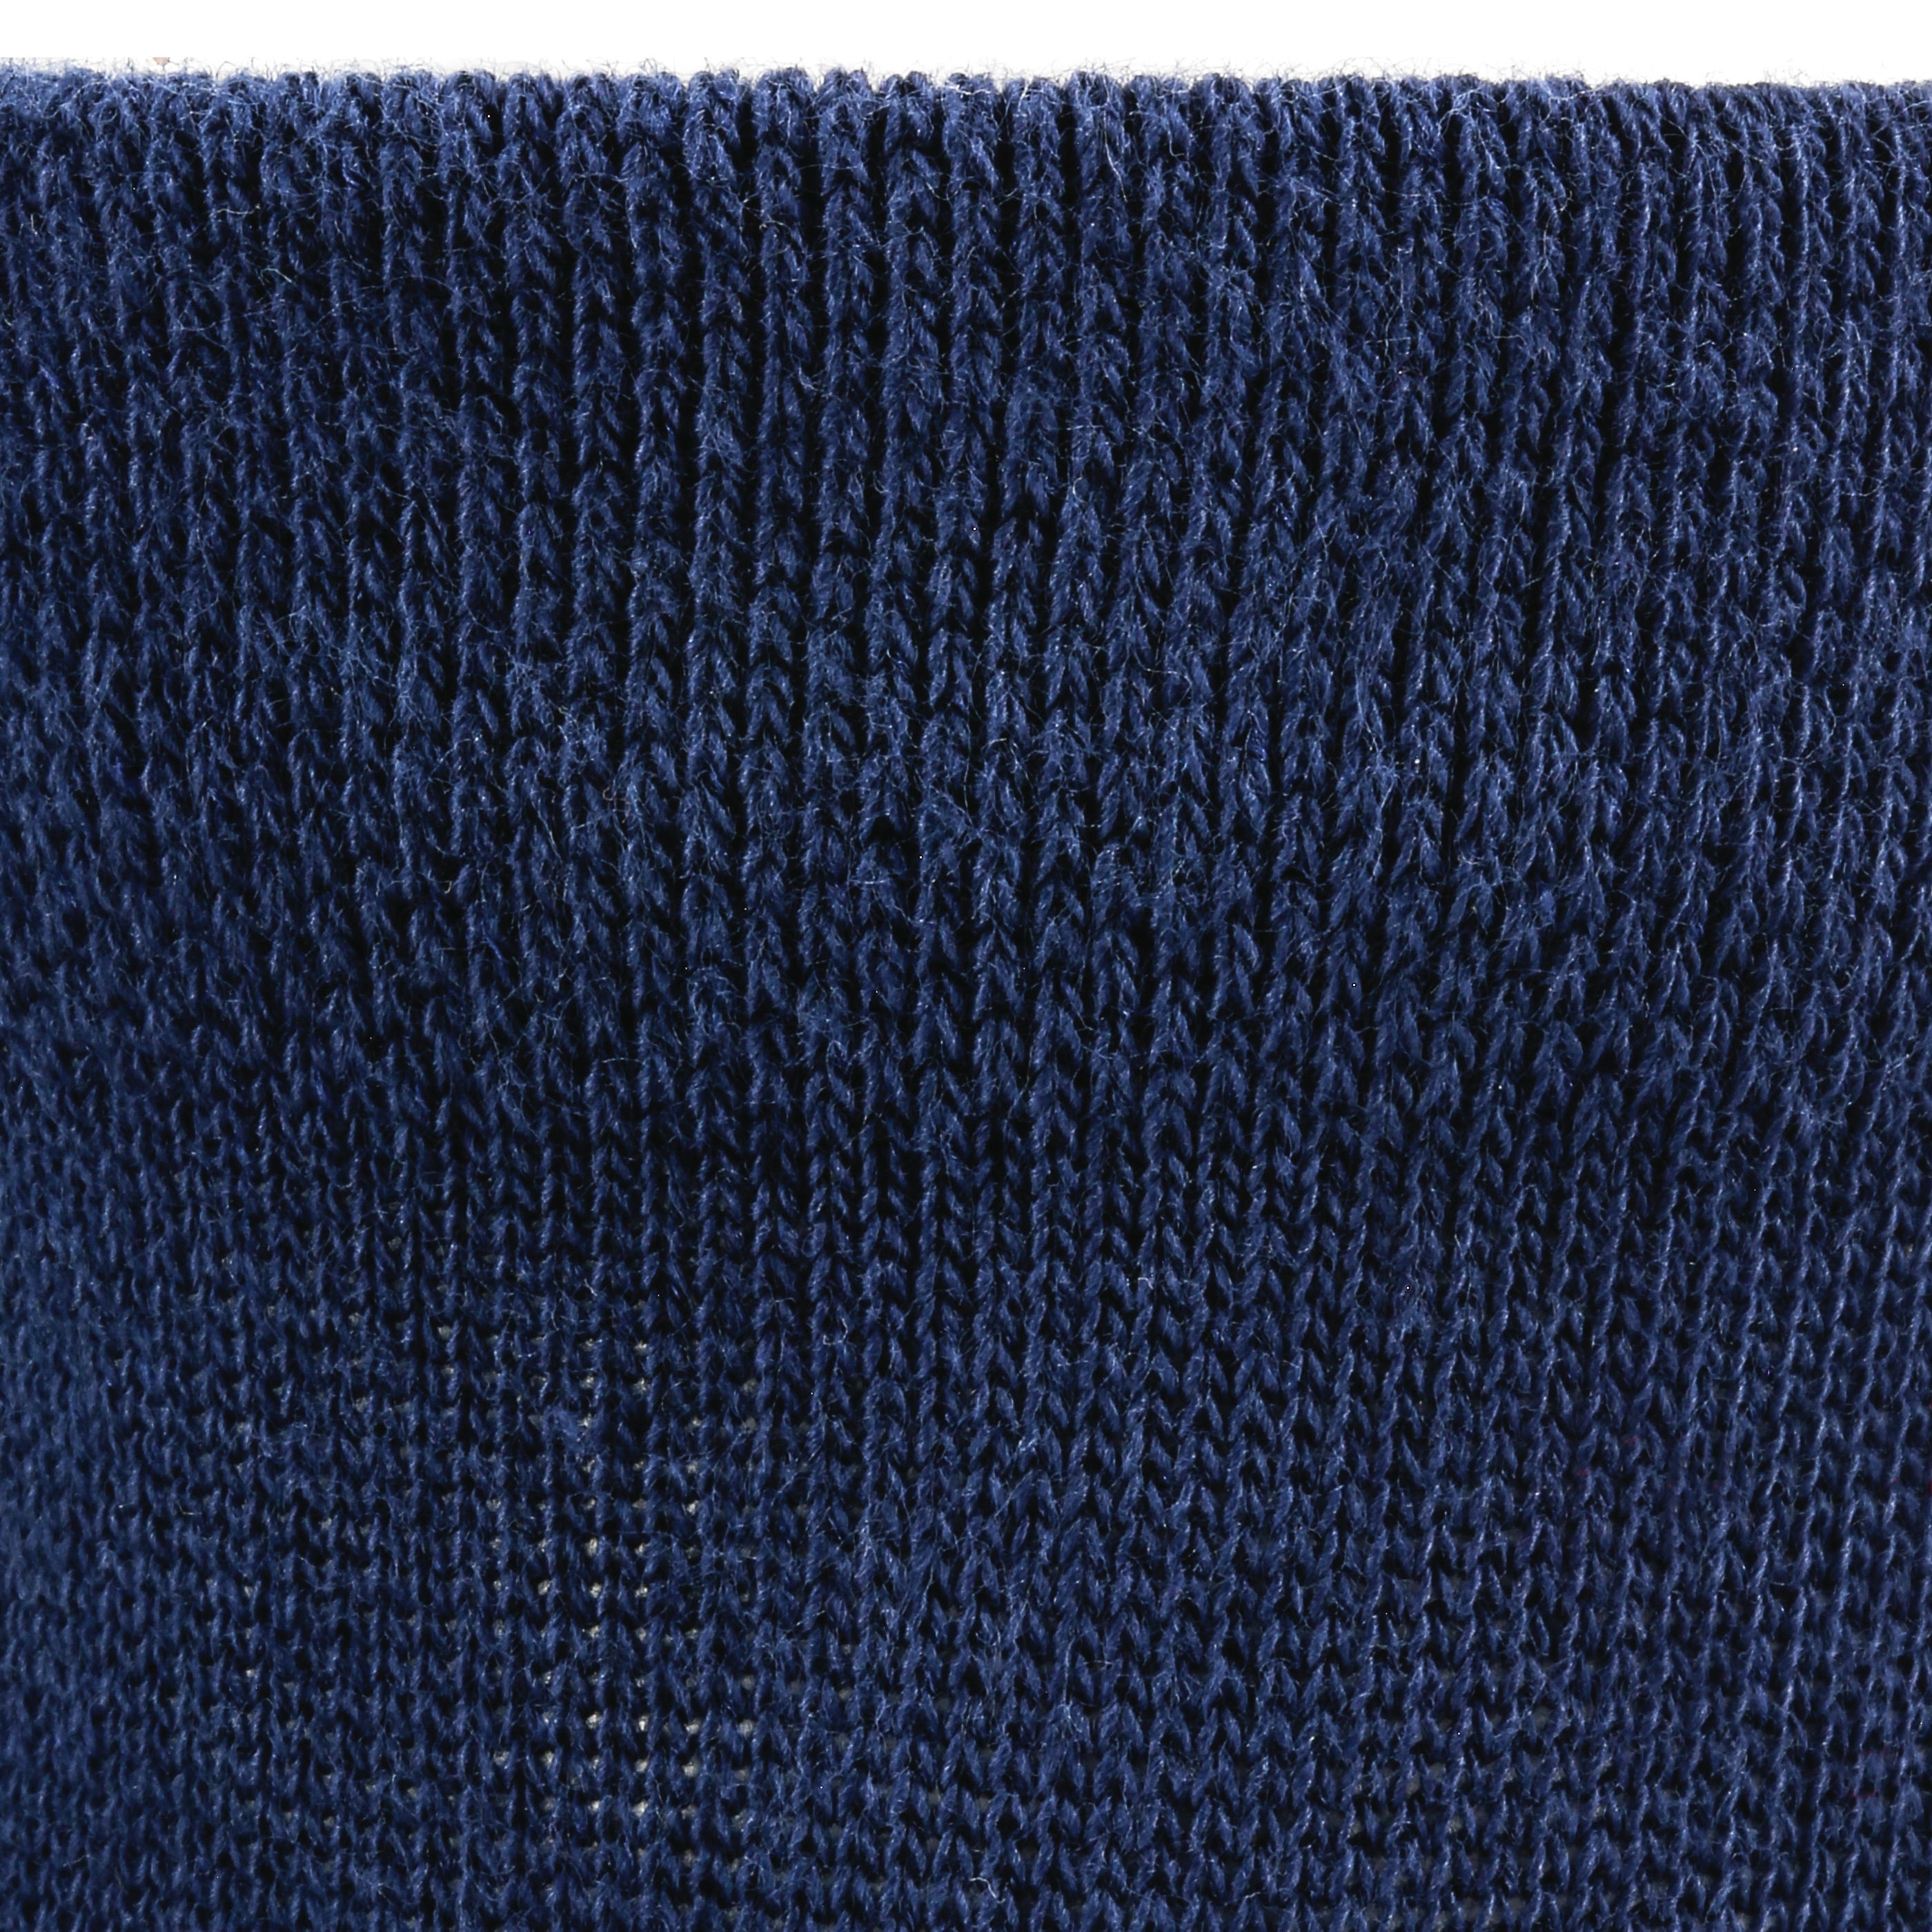 Junior Socks Mid length - Tri pack Navy